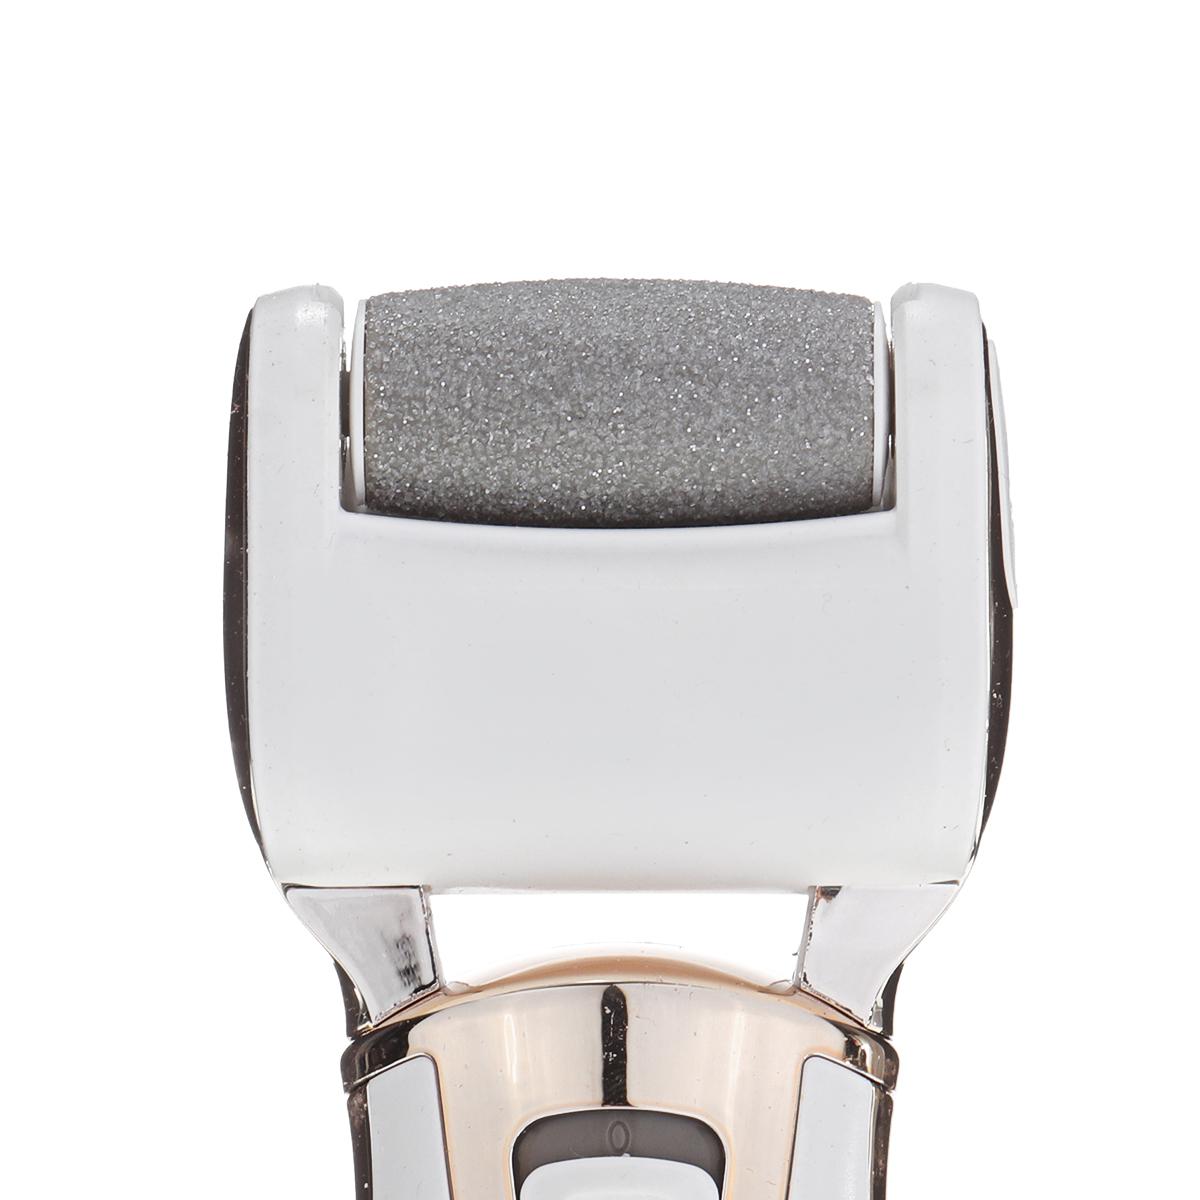 Electric Foot Grinder Pedicure File Machine Dead Skin Care Callus Remover Tool